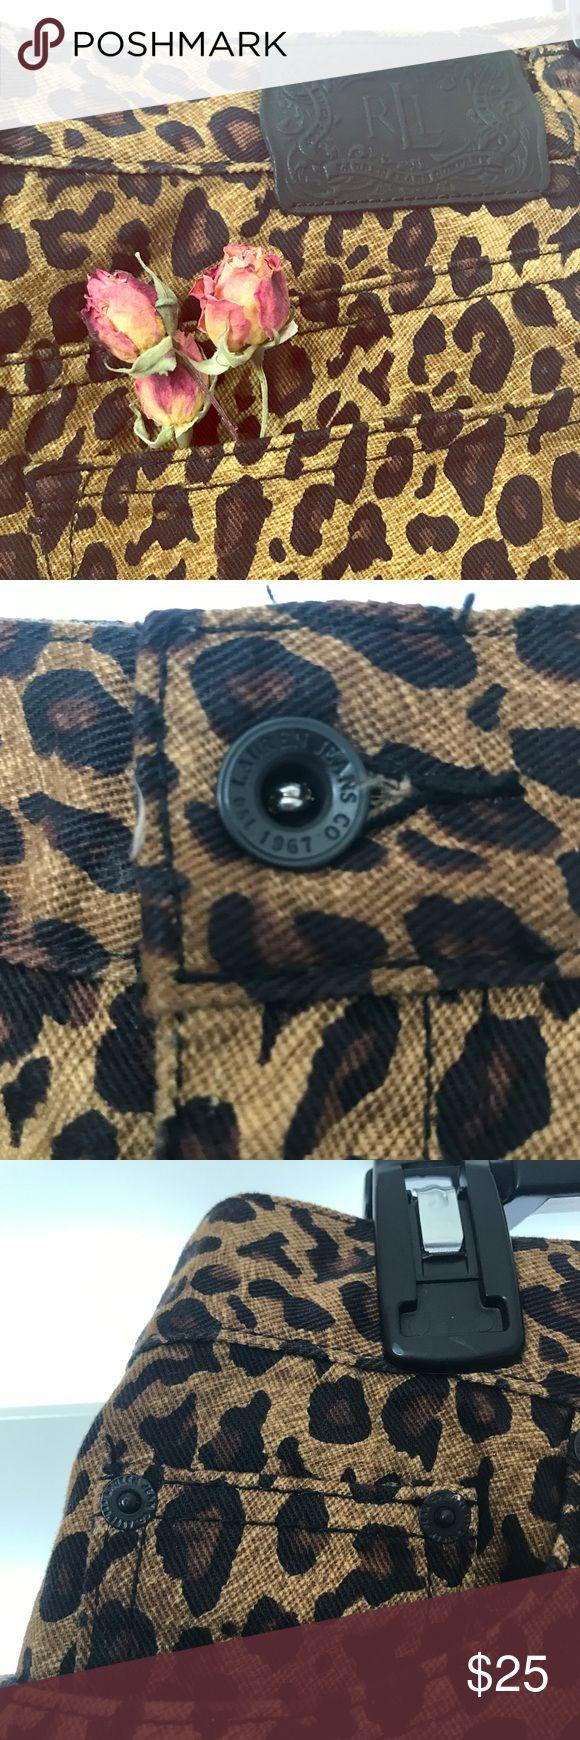 Ralph Lauren Cheetah Print Skirt Like new denim skirt featuring front and back pockets, iconic animal print, and a back slit. Ralph Lauren Skirts Midi